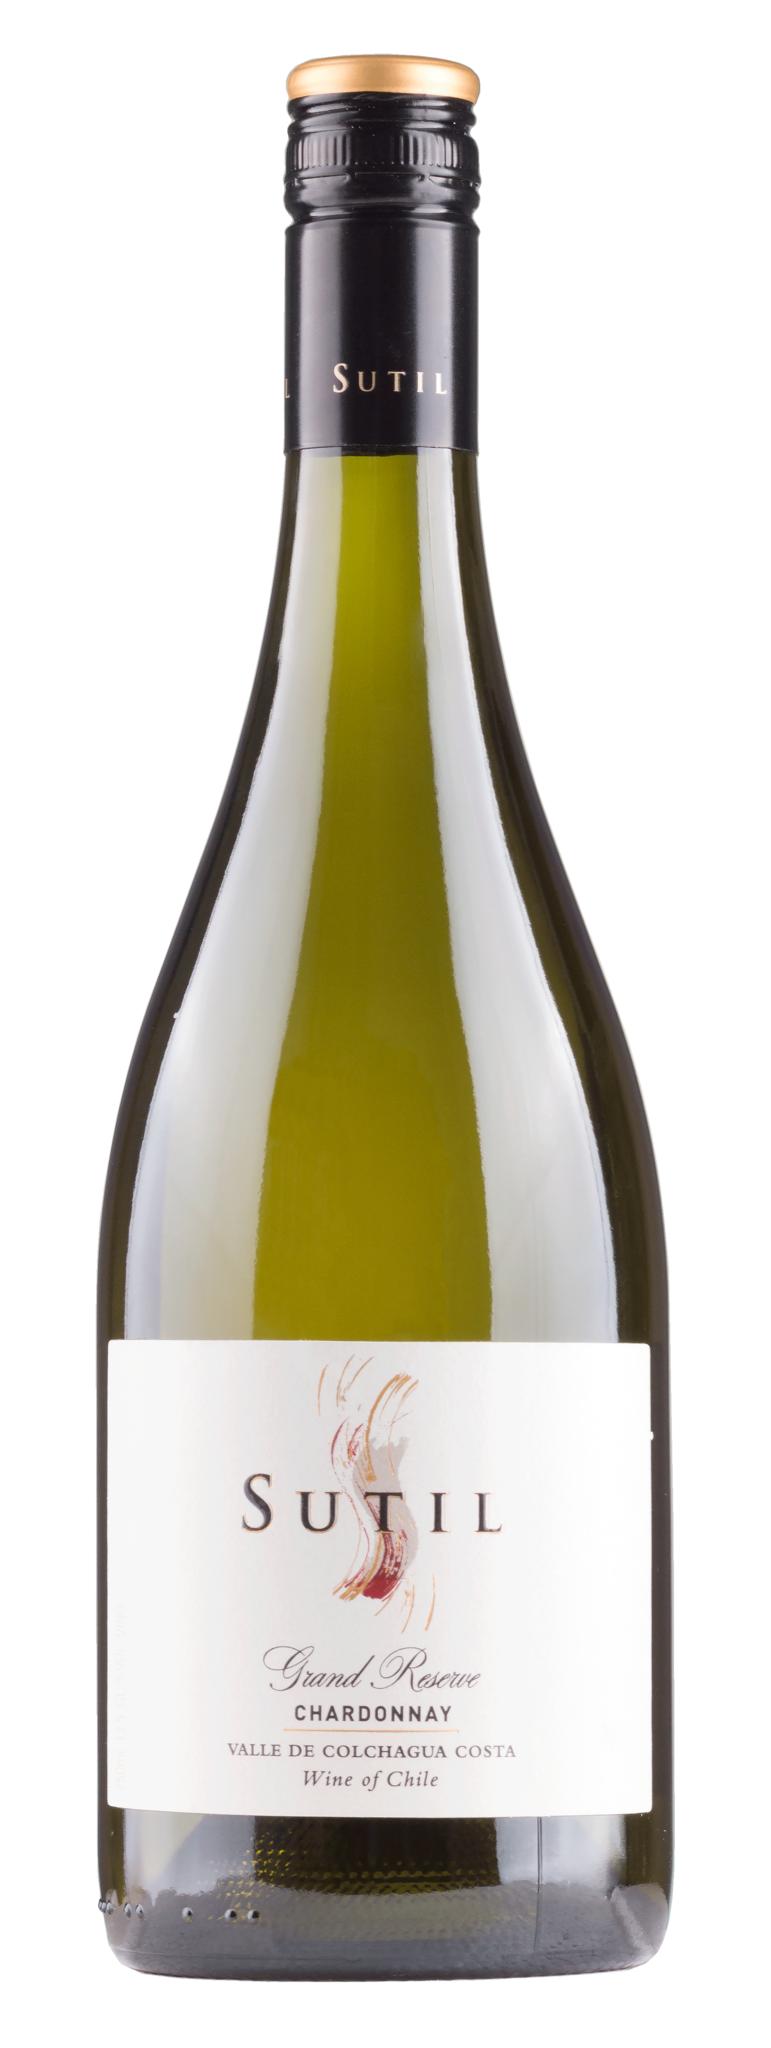 Vina Sutil, Chile 2020 Chardonnay Grand Reserve Colchagua Valley, Vina Sutil